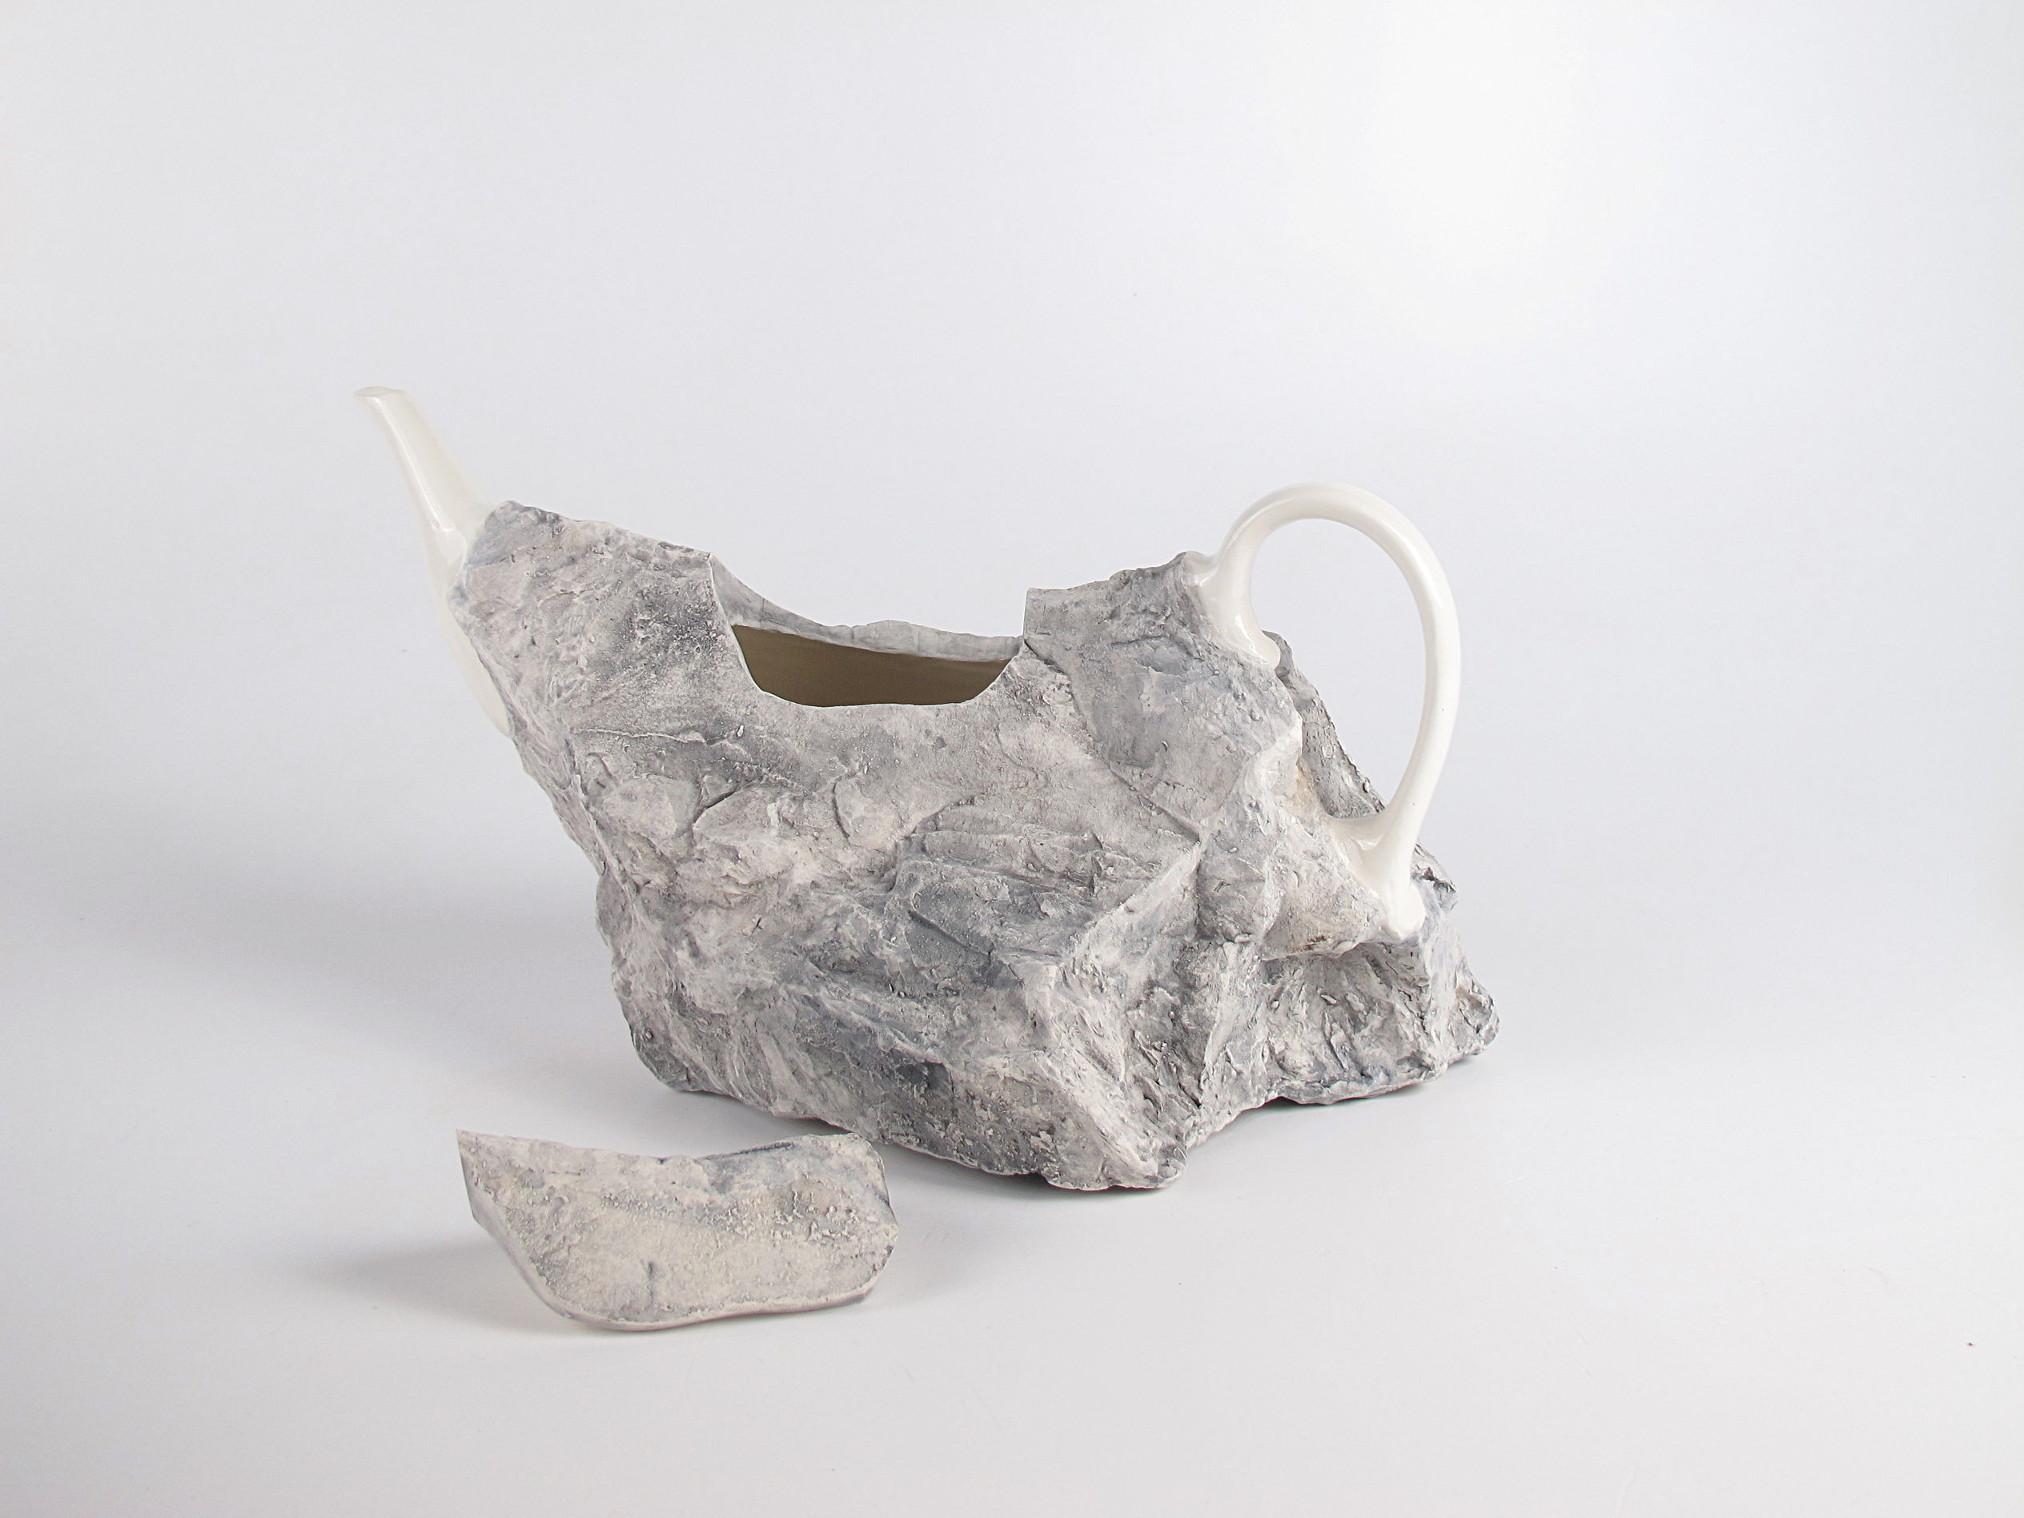 jug rock Lapidaria ceramic contemporary art project Studio17 Caterina Sbrana Gabriele Mallegni